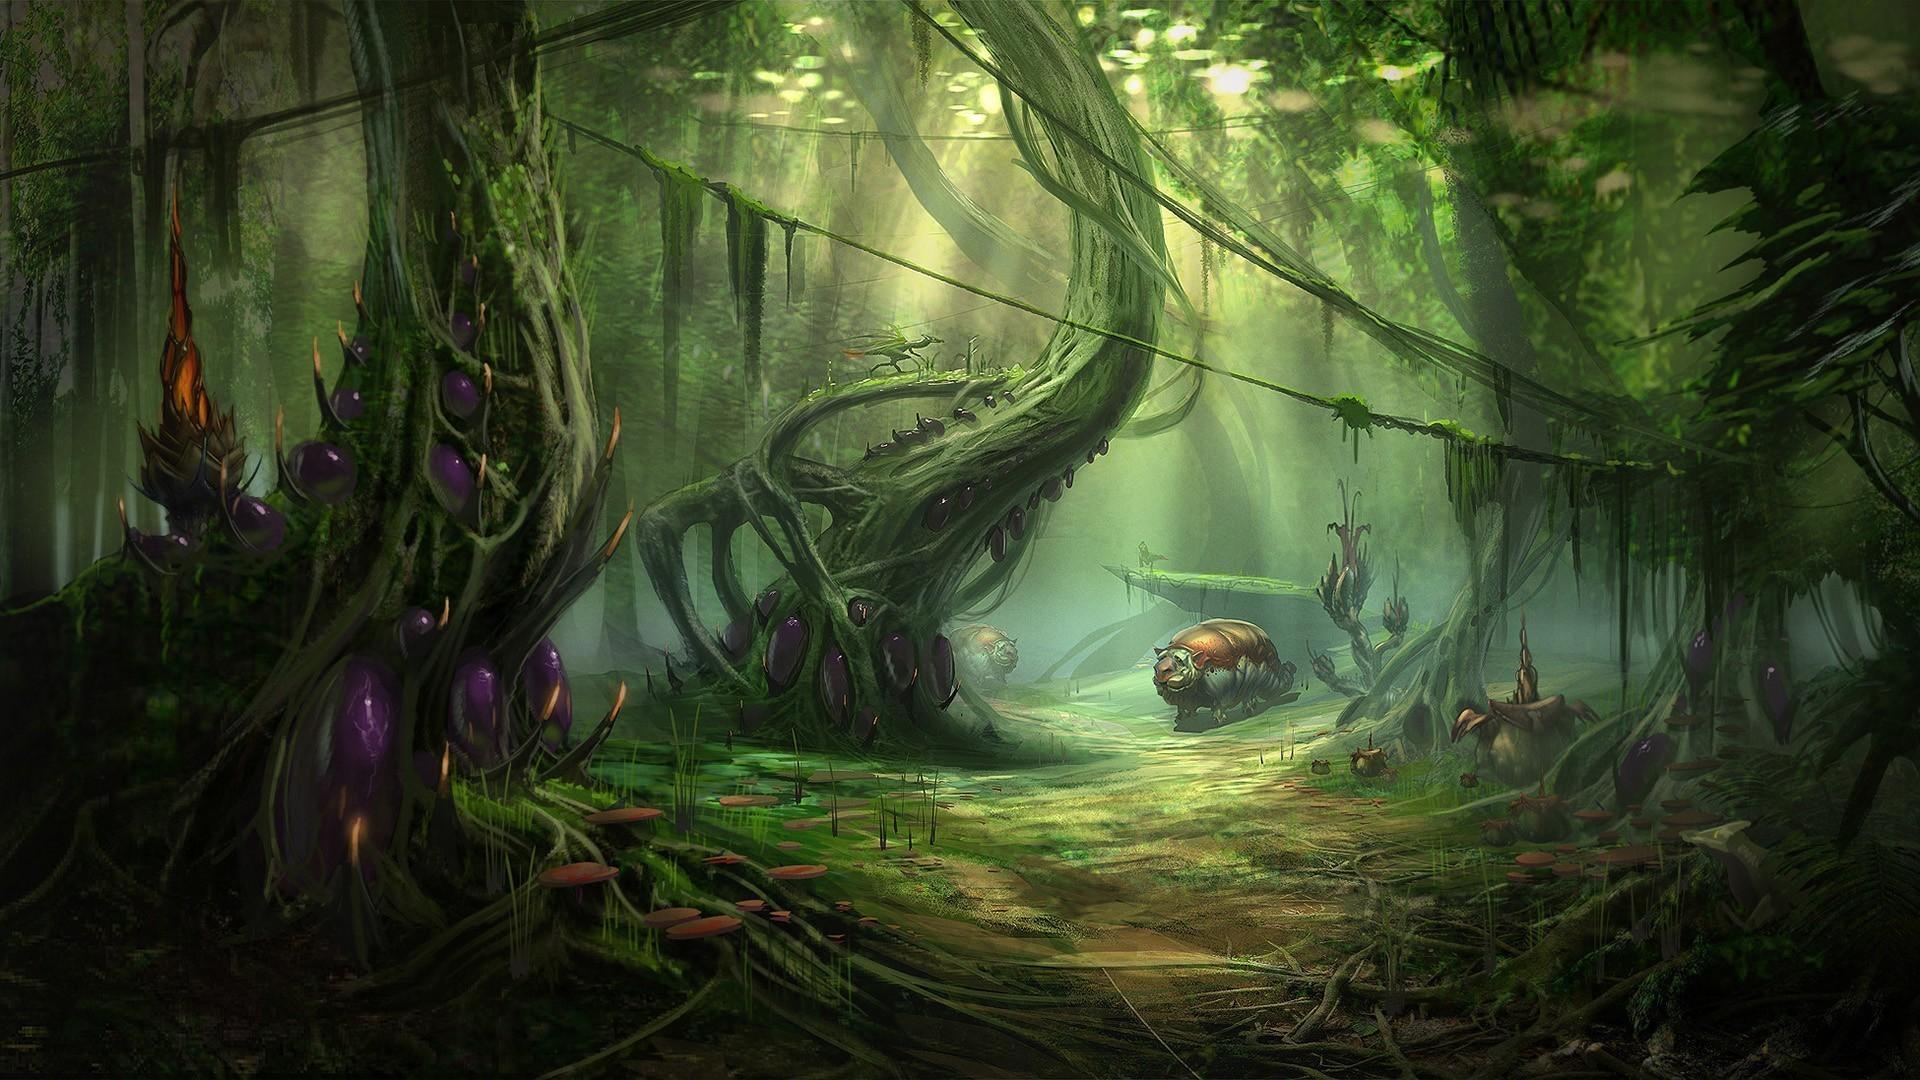 nature jungle forest planets fantasy art alien landscapes alien wallpaper  Best Wallpapers,Top Wallpapers,Wallpapers for free,Desktop Wallpaper, HD  Wallpaper